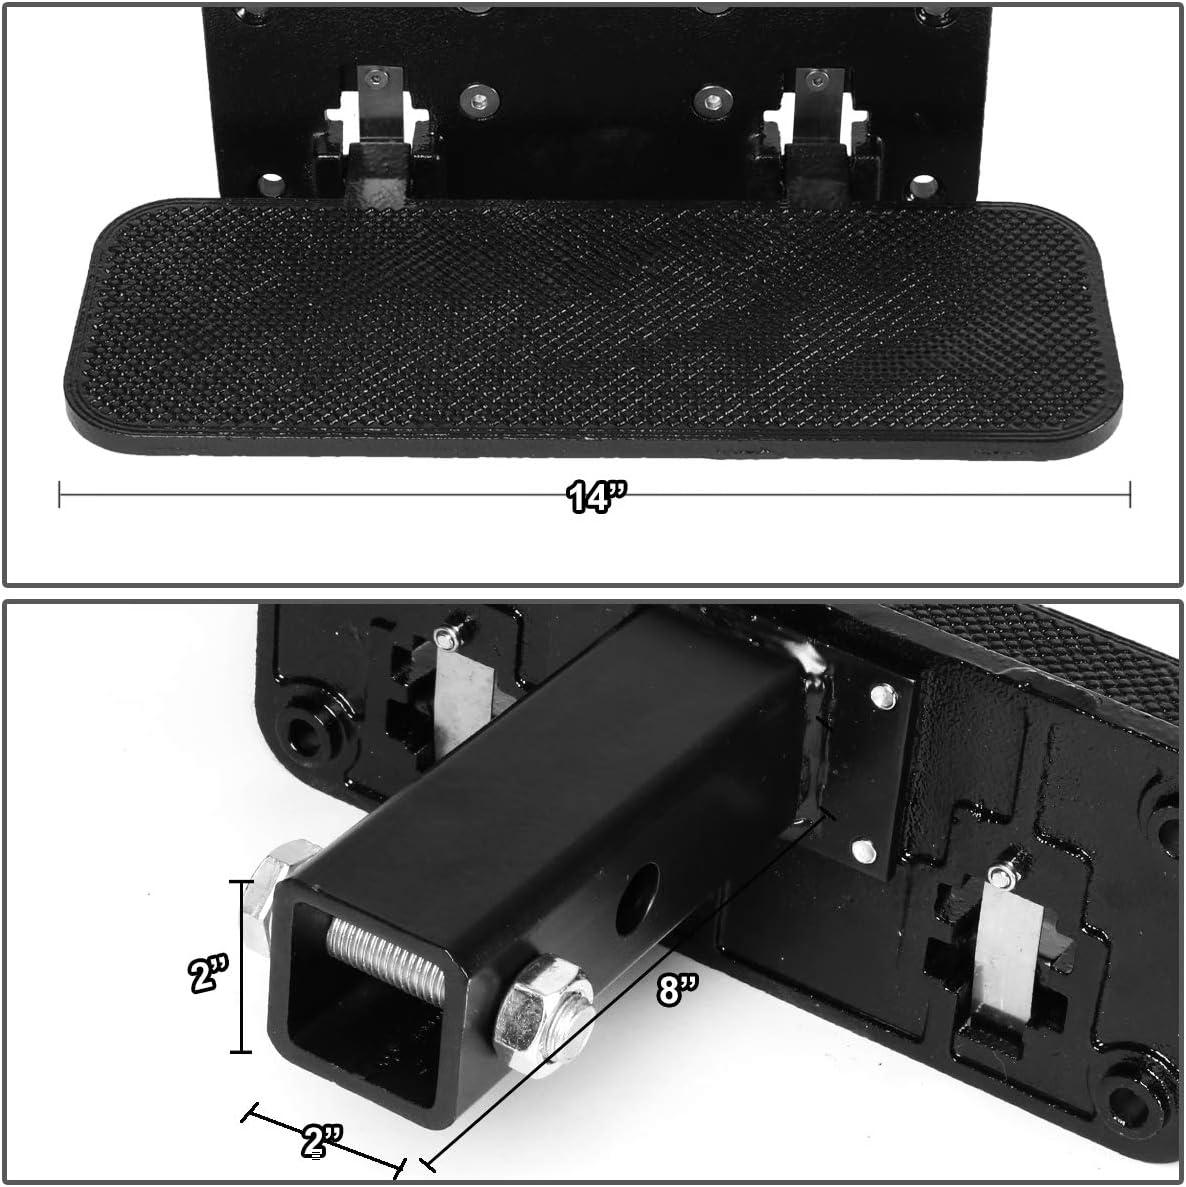 DNA Motoring ZTL-Y-0111-BK 2 Inches Receiver Heavy Duty Aluminum Trailer Folding Hitch Step Board Universal